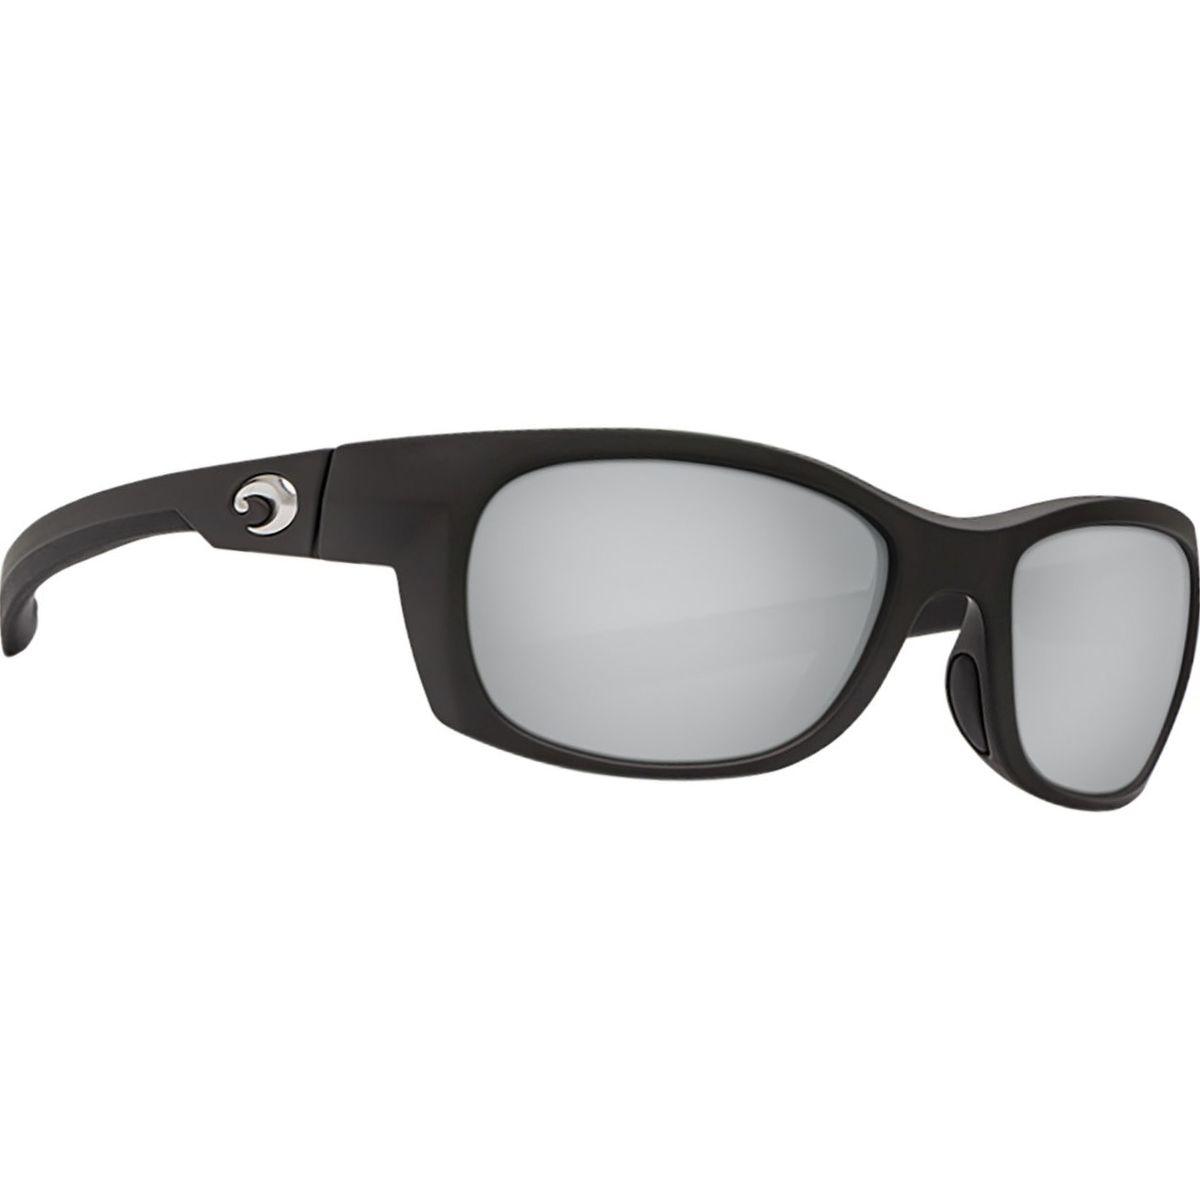 Costa Trevally 580P Polarized Sunglasses - Women's